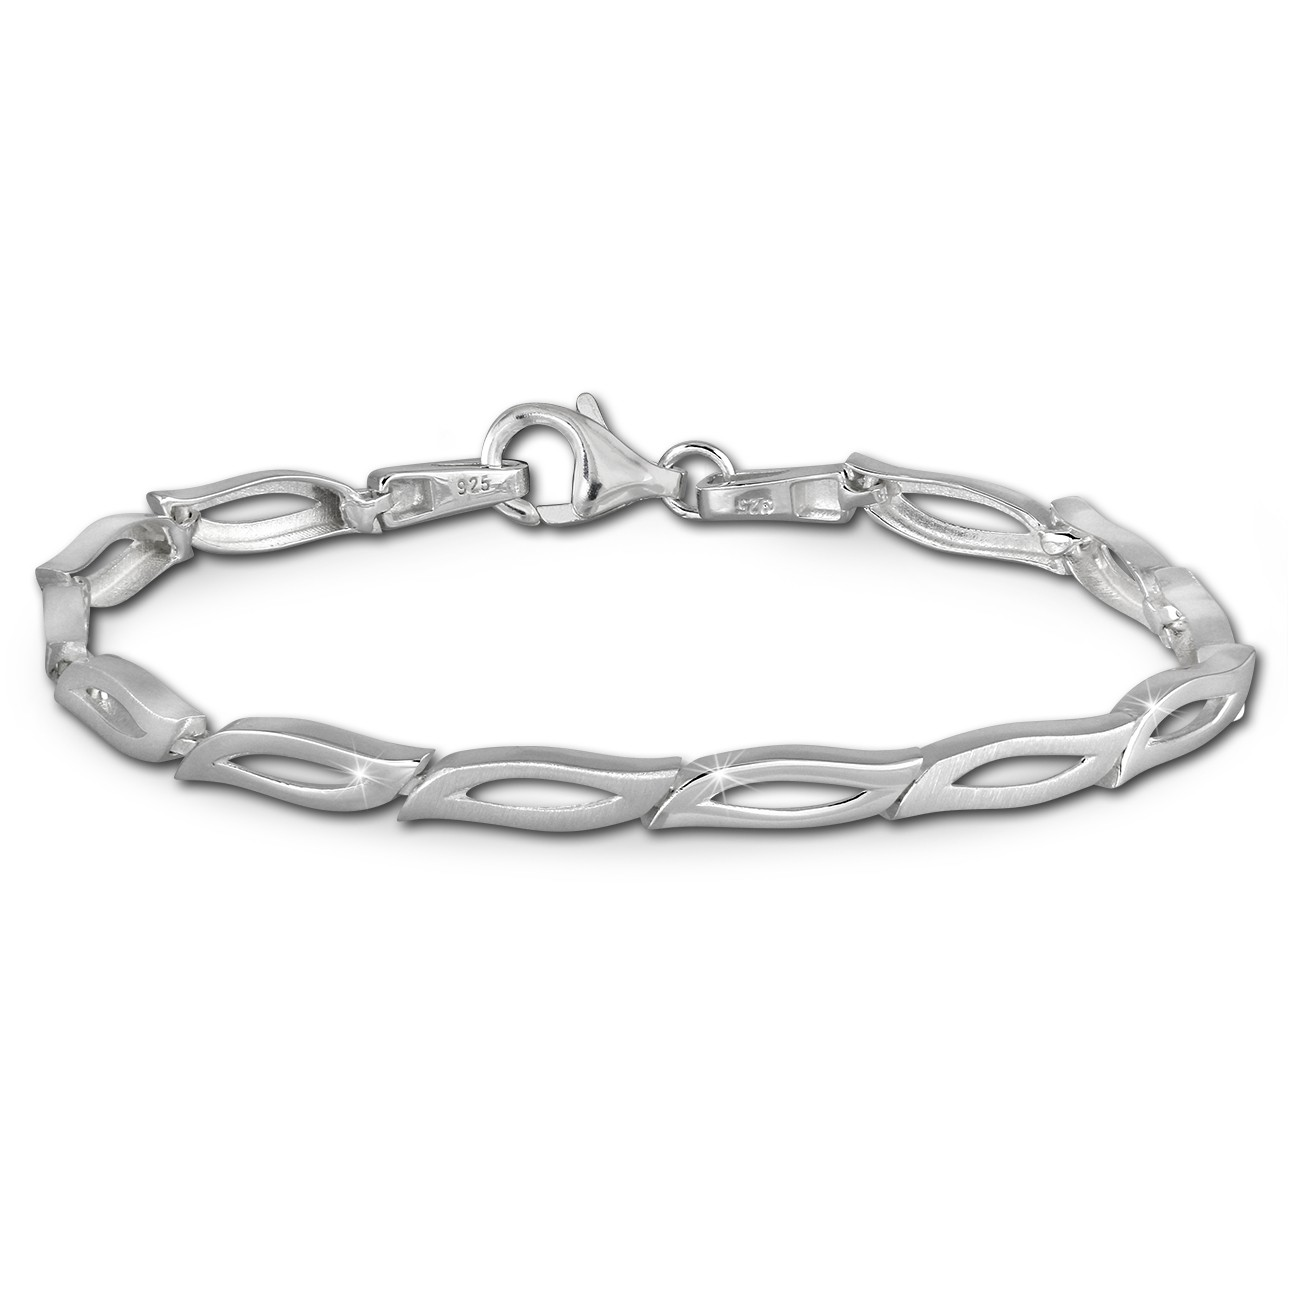 SilberDream Armband Blütenblatt matt/glänzend 925 Sterling Silber 19cm SDA428